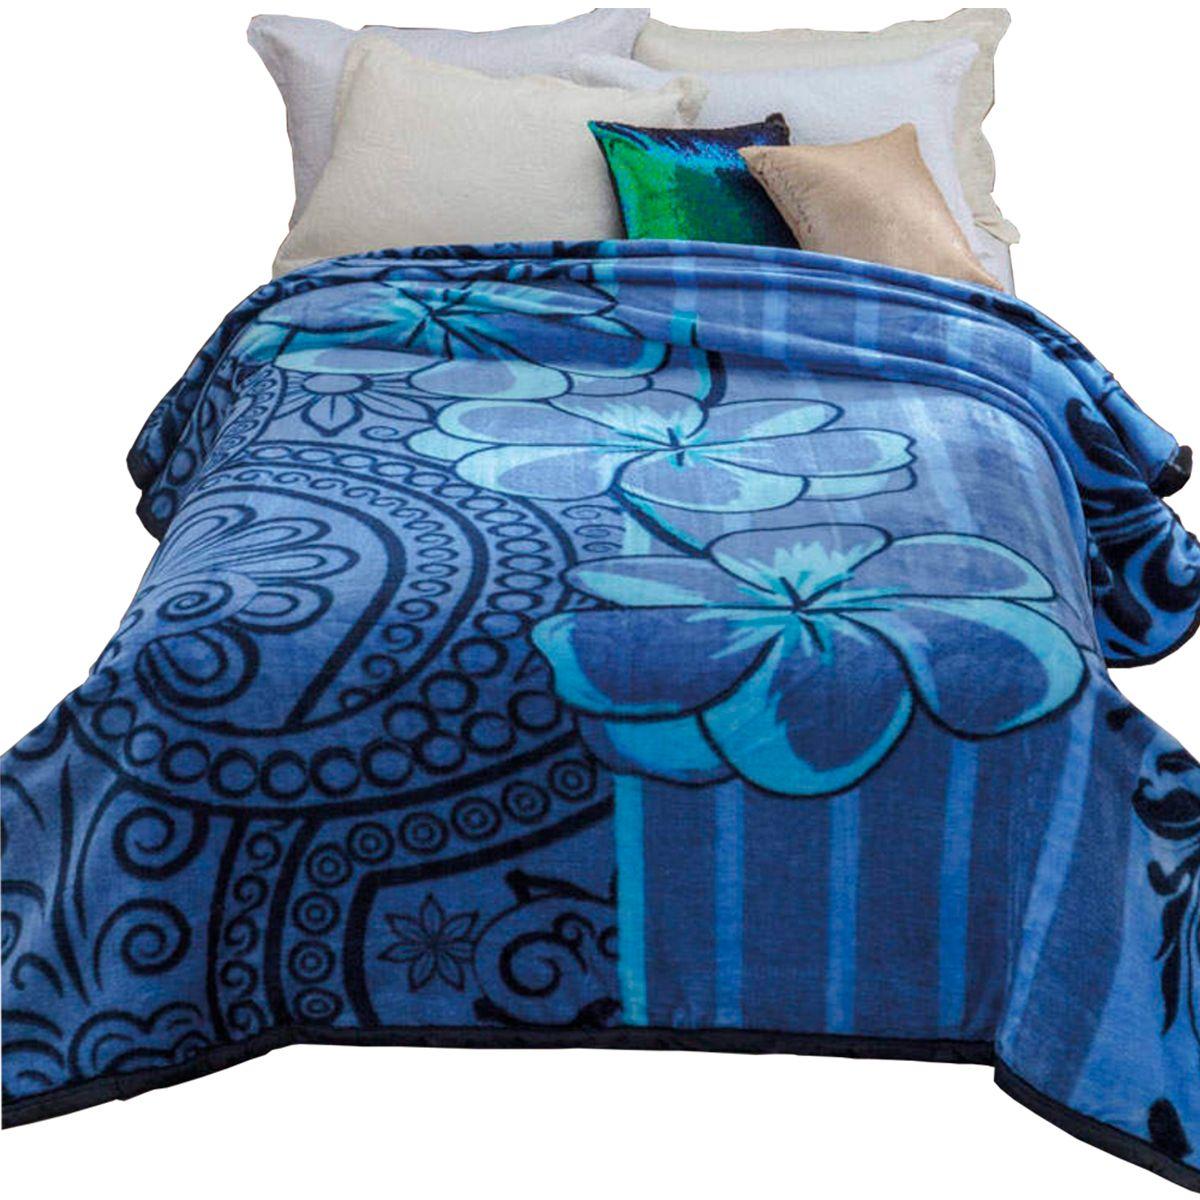 Cobertor Dyuri C/ cinta Casal Nuria 180x220cm